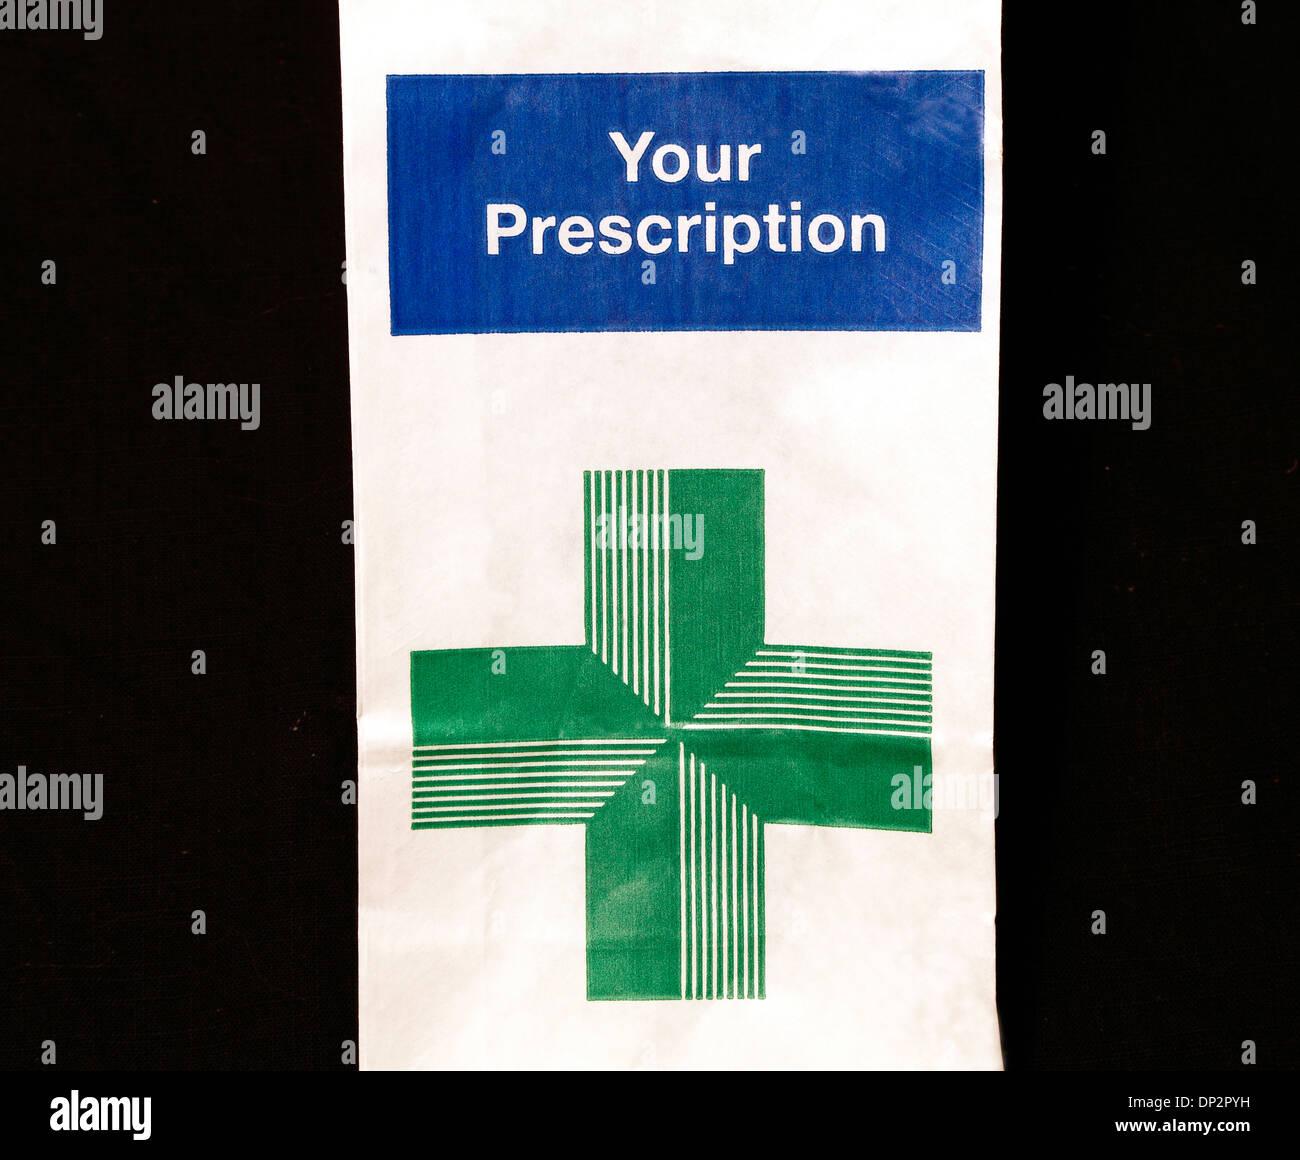 N H S Prescription bag, Your Prescription, UK National Health Service, medicine - Stock Image